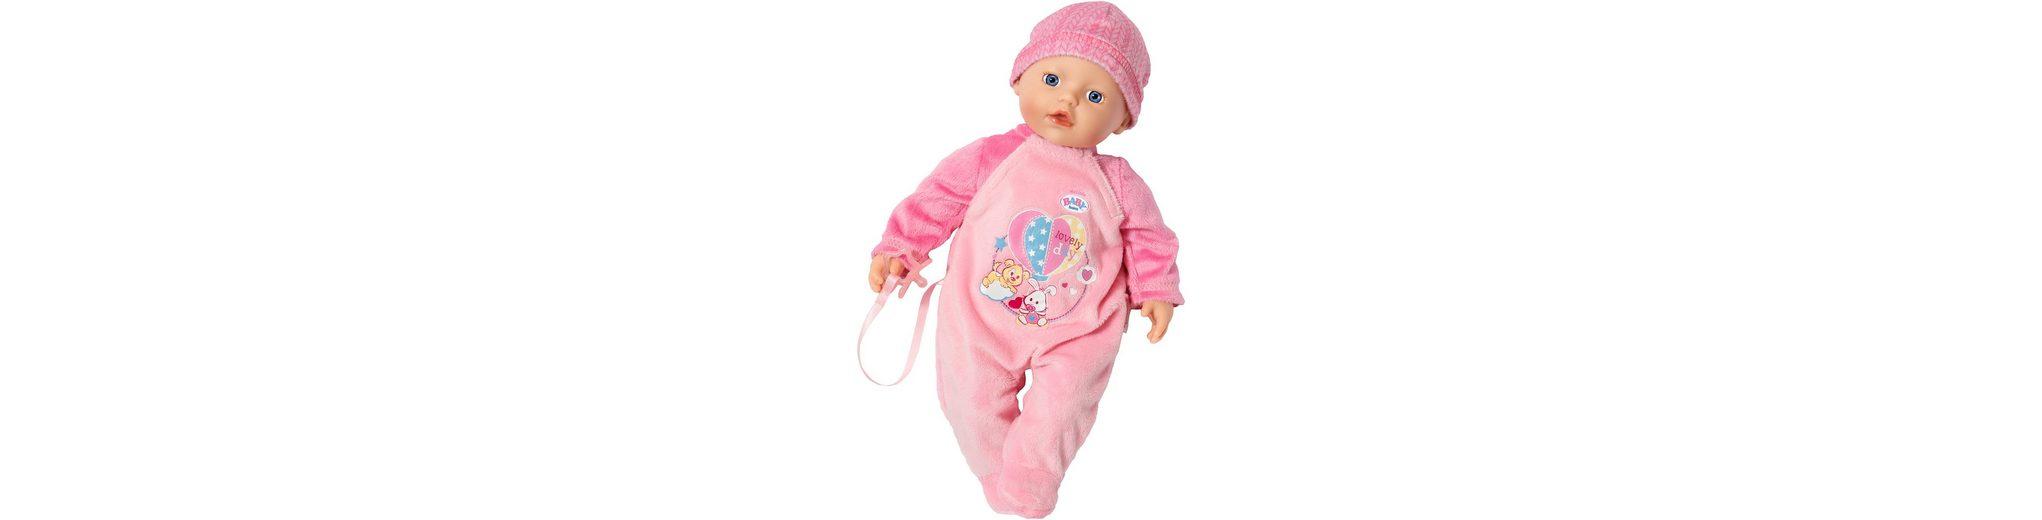 Zapf Creation Babypuppe, »My Little BABY born® Super Soft«